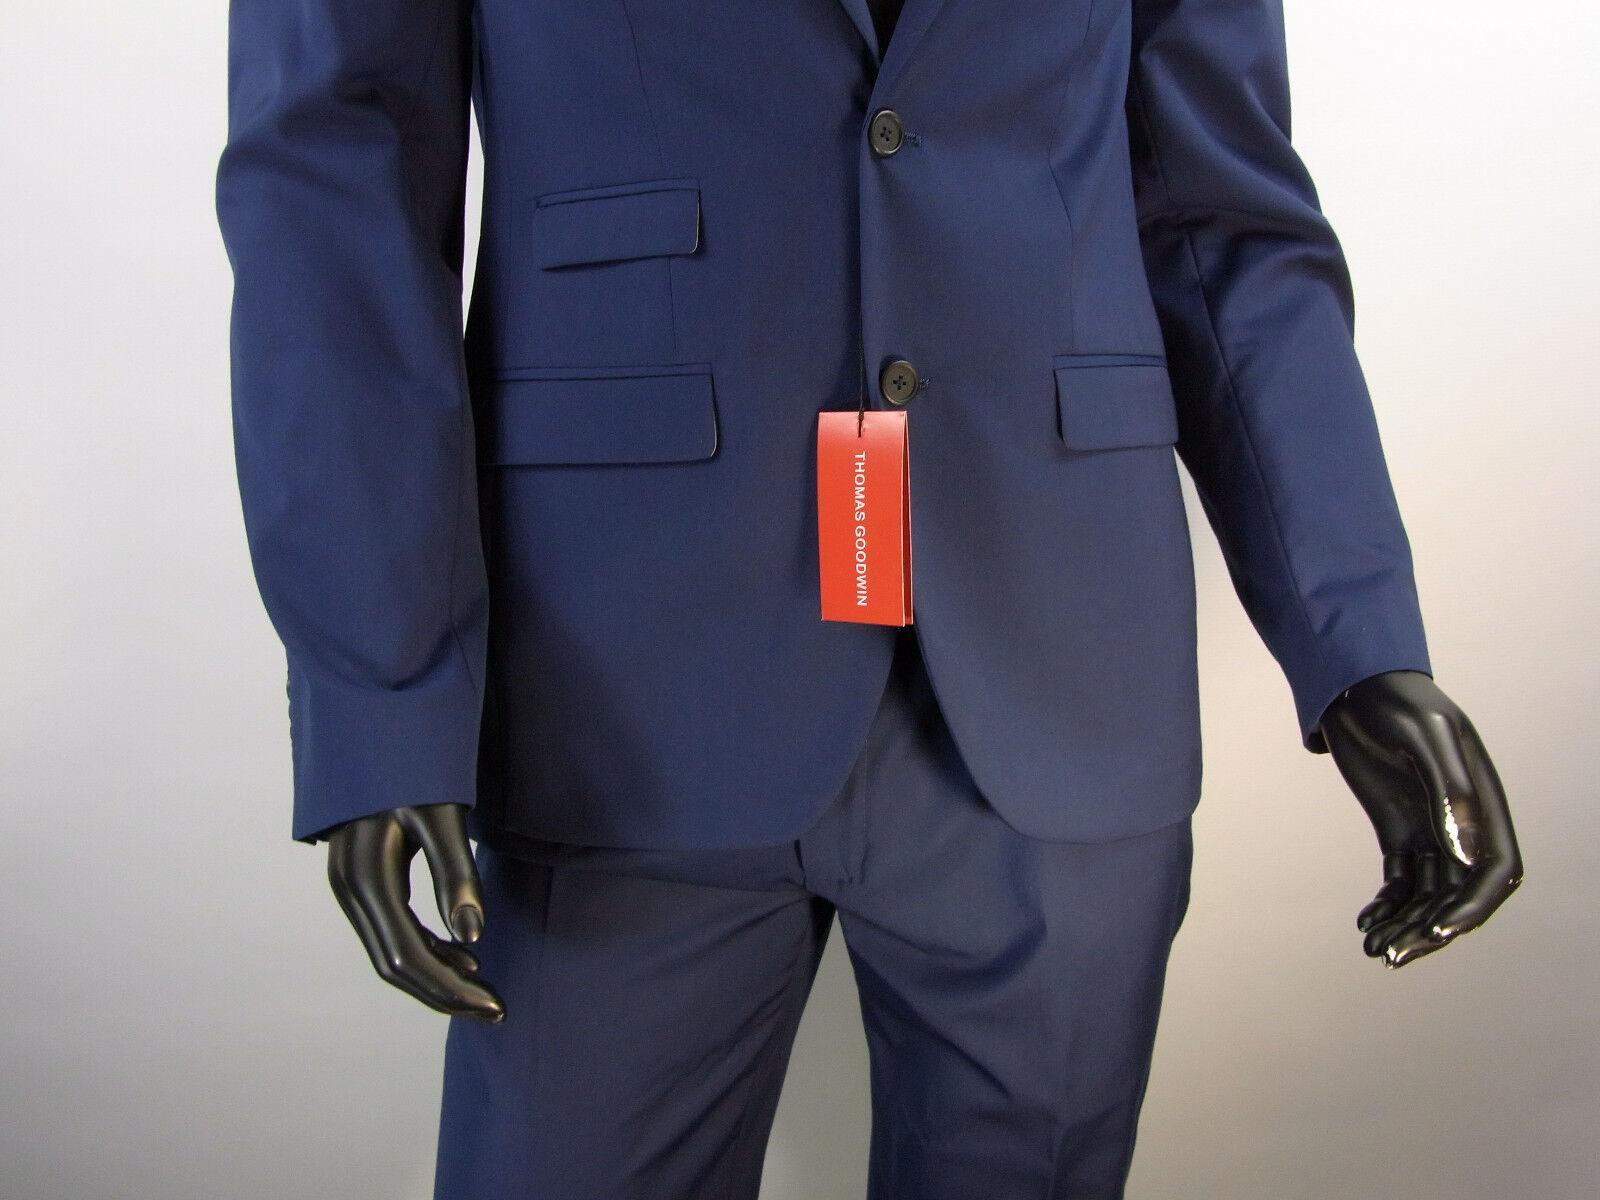 Herren Anzug Thomas Goodwin << Blau Marine SLIM FIT  Größe 102 Model 3